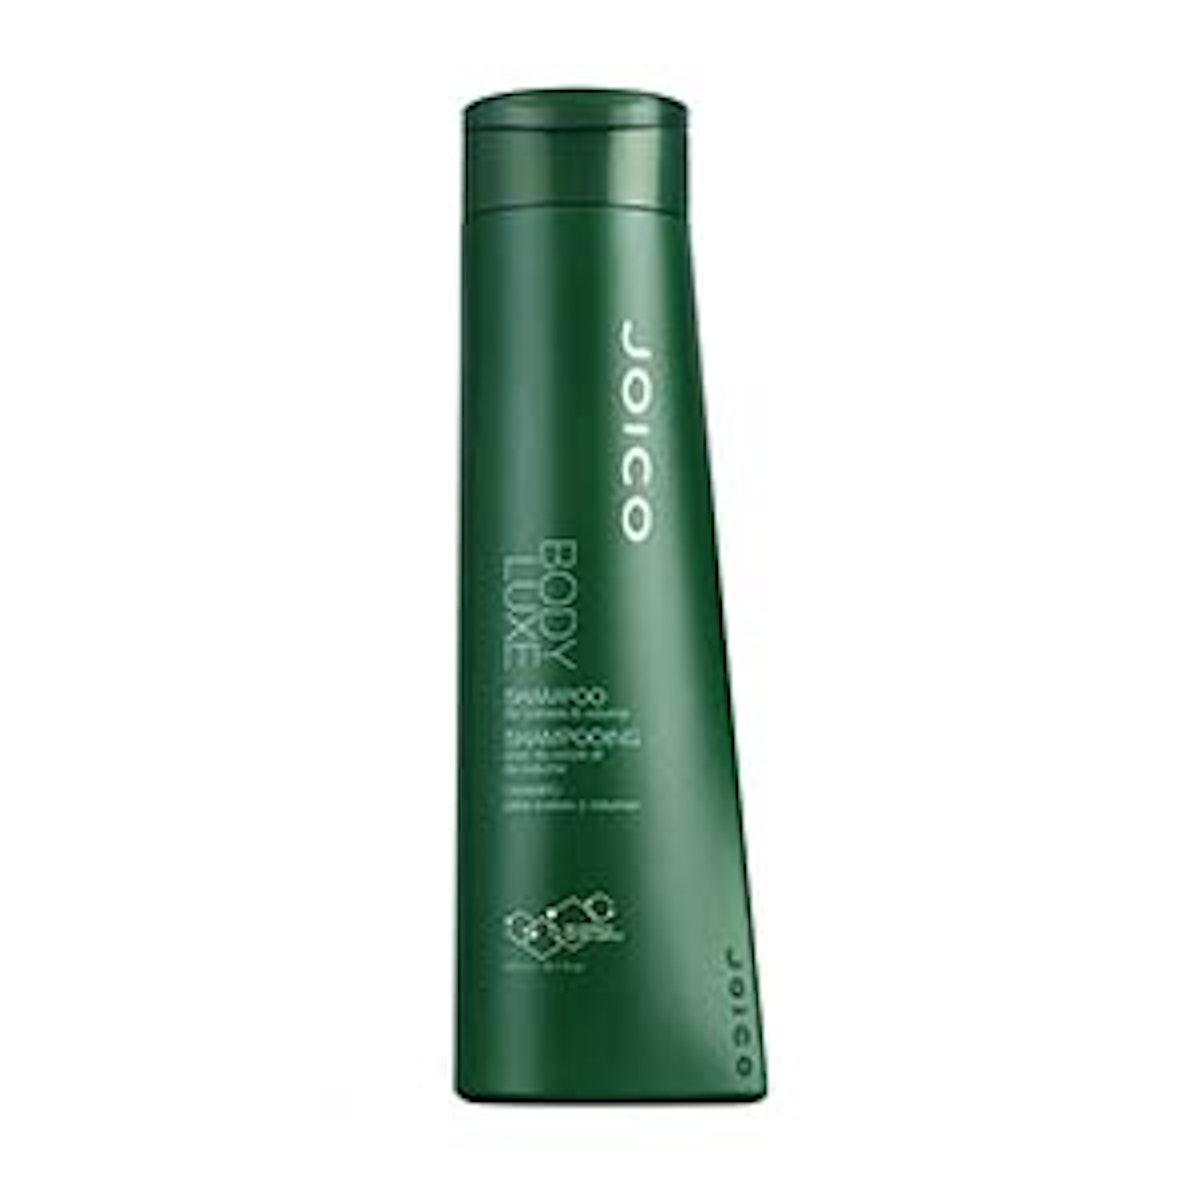 Body Luxe Shampoo 10.1 oz